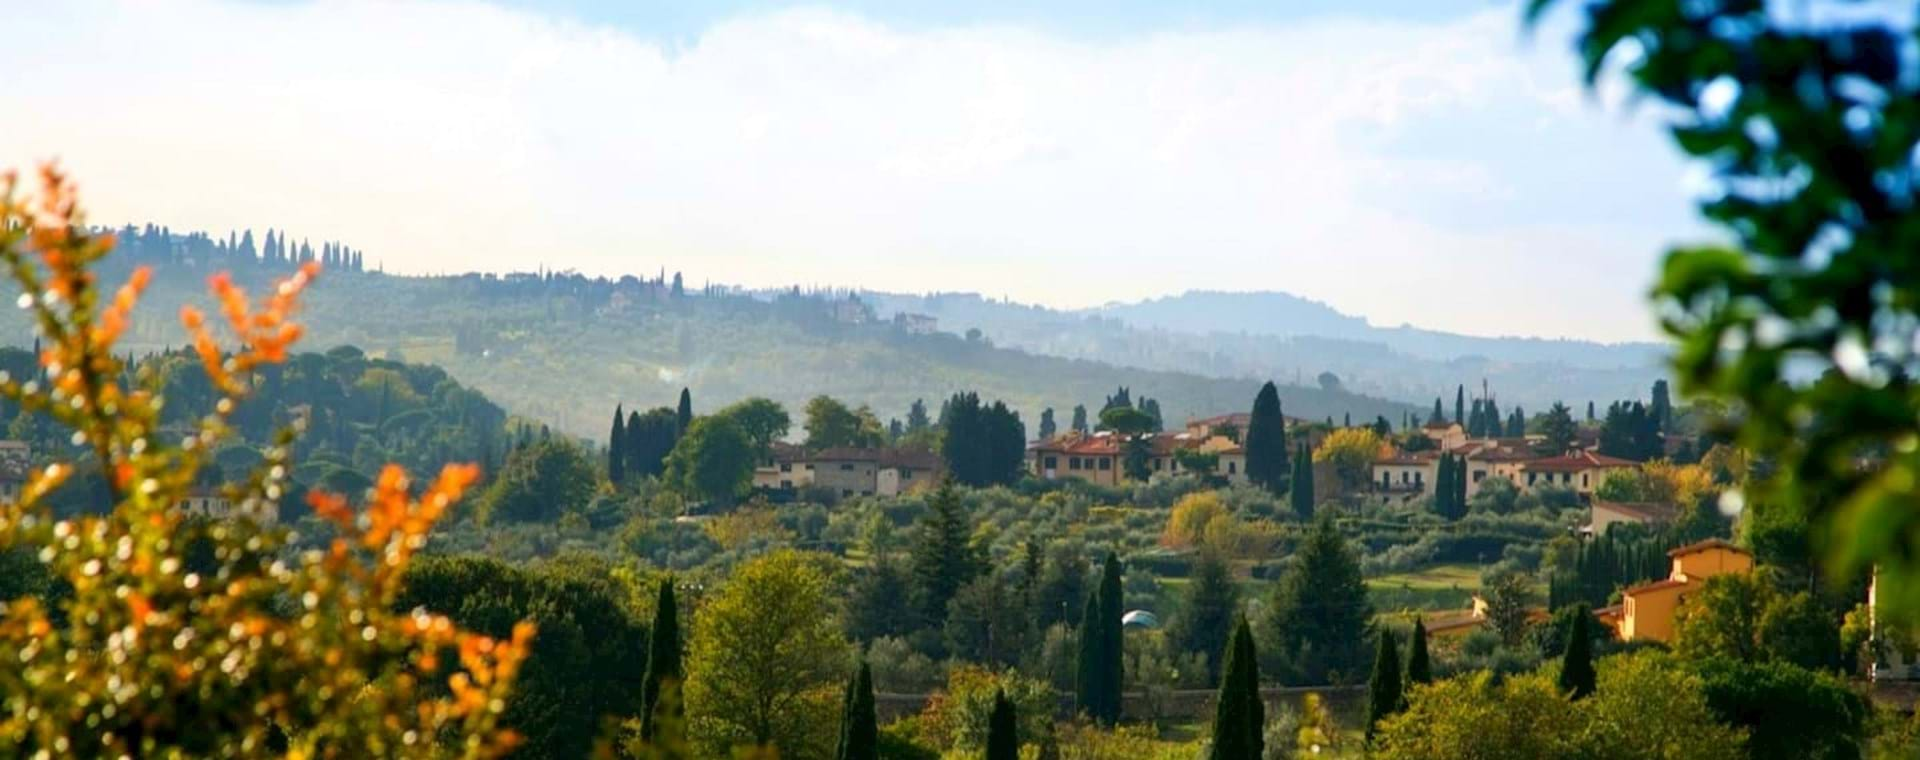 Tuscan Vineyard Villa Dinner and Wine Tasting Experience